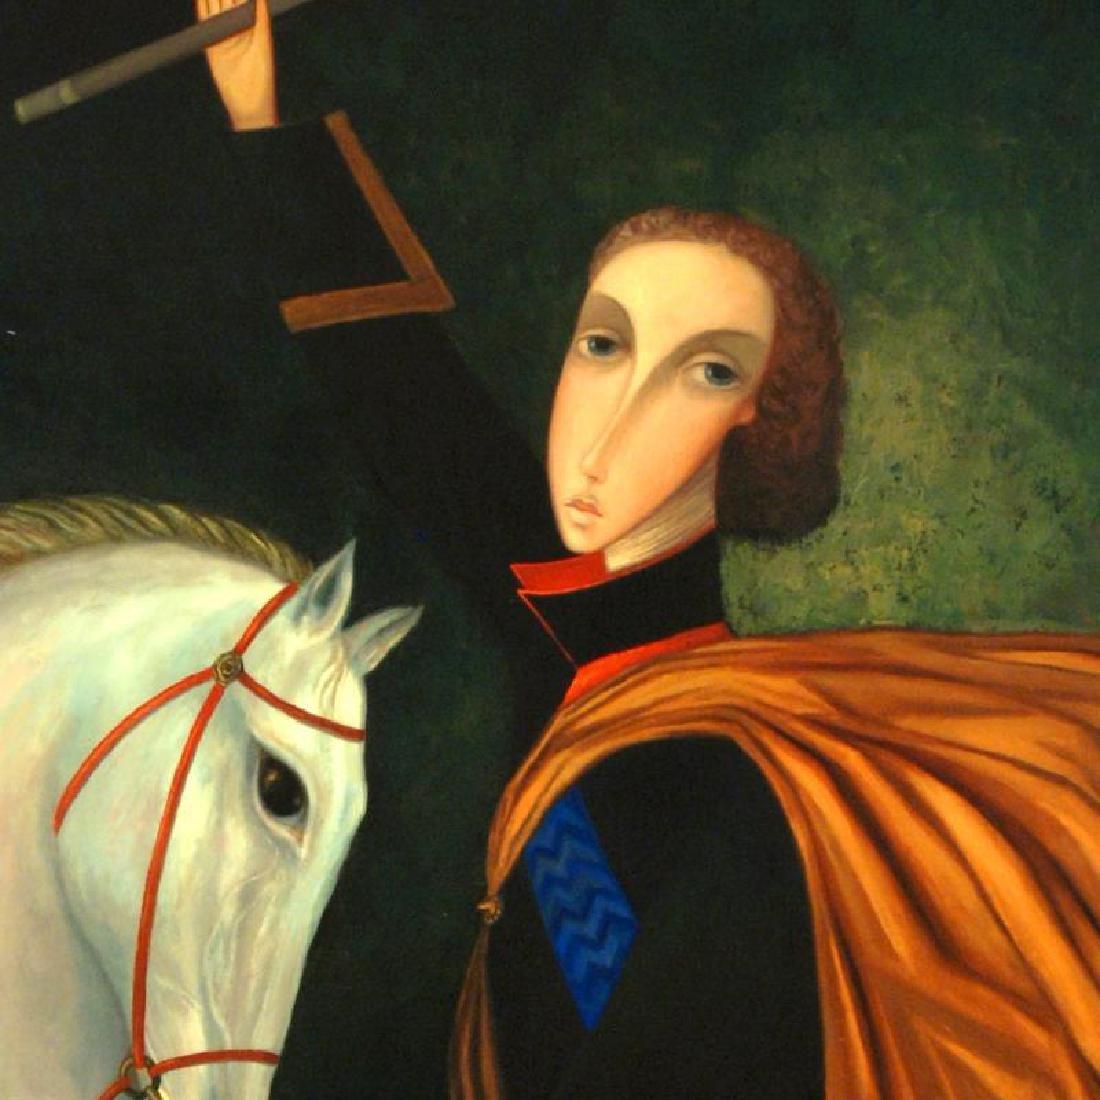 Peter The Great:Emperor by Smirnov (1953-2006) - 2